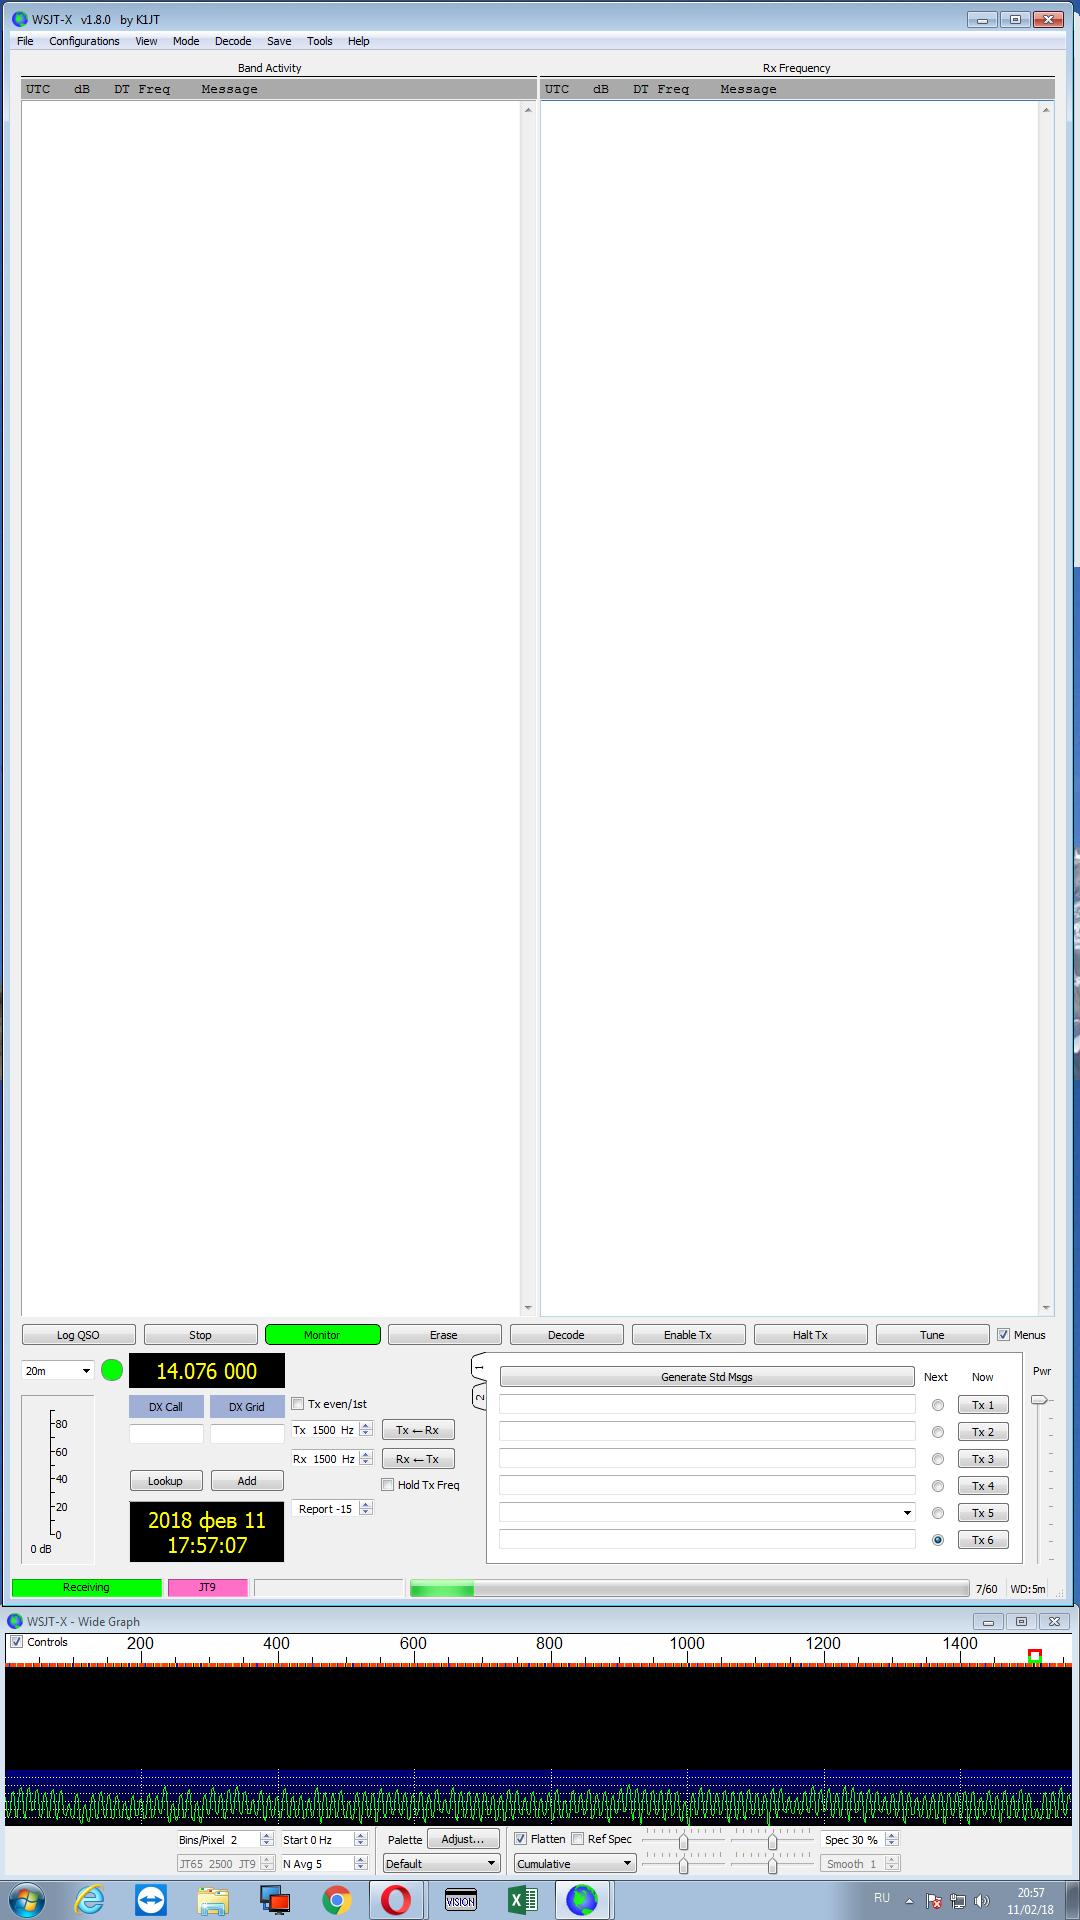 Нажмите на изображение для увеличения.  Название:wsjtx-1.8.0.png Просмотров:11 Размер:119.6 Кб ID:205977